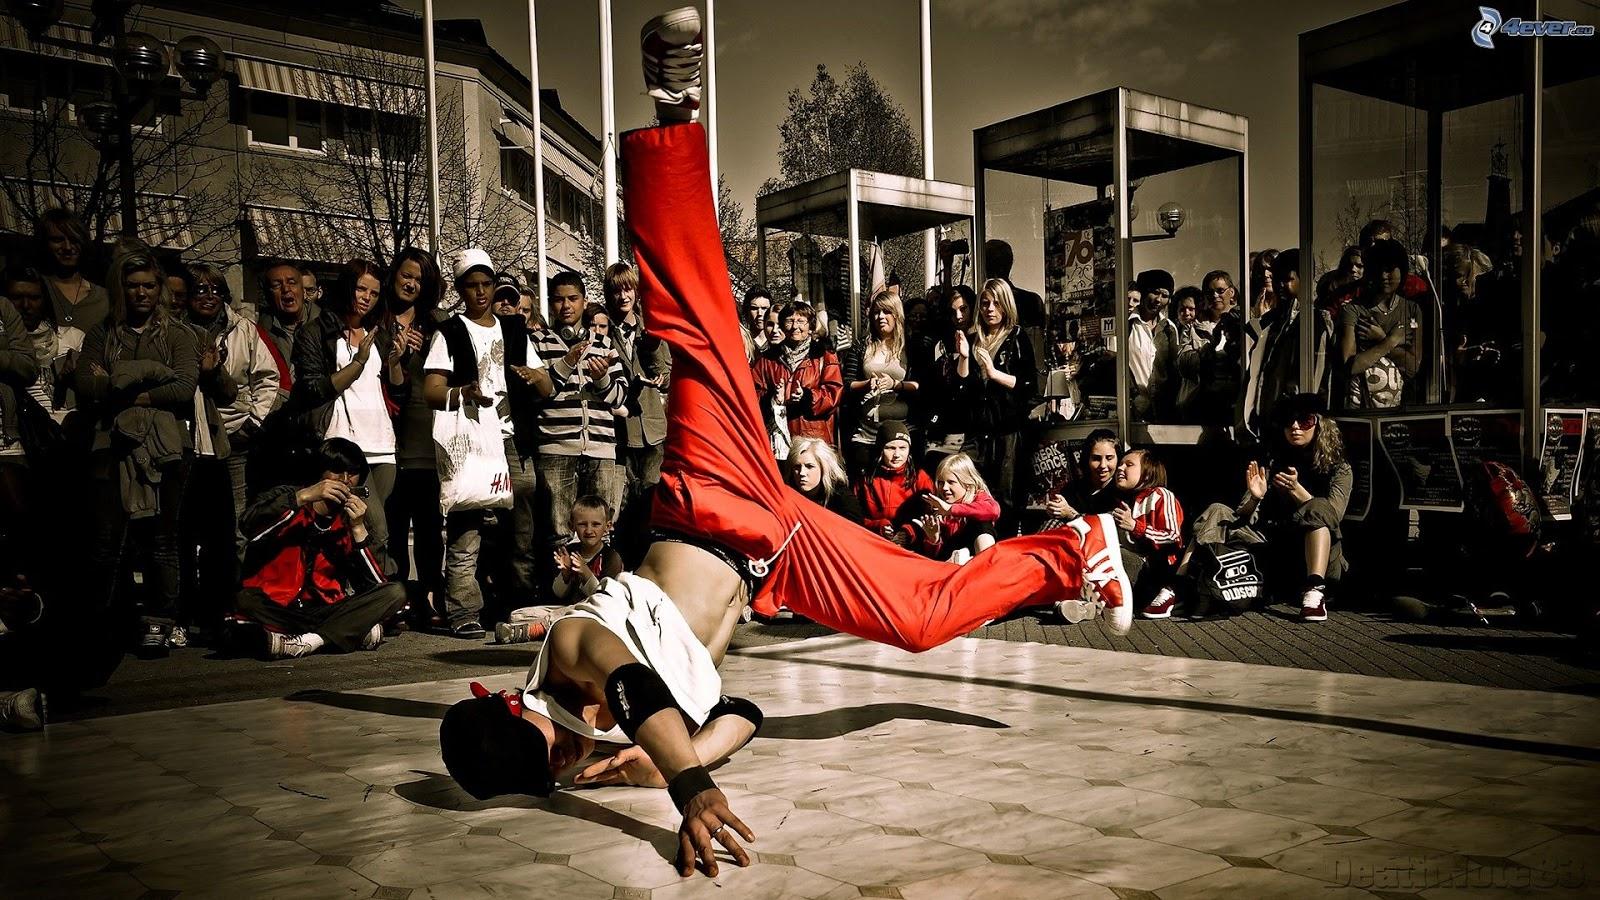 El break dance se creó en 1970. dfb13675409